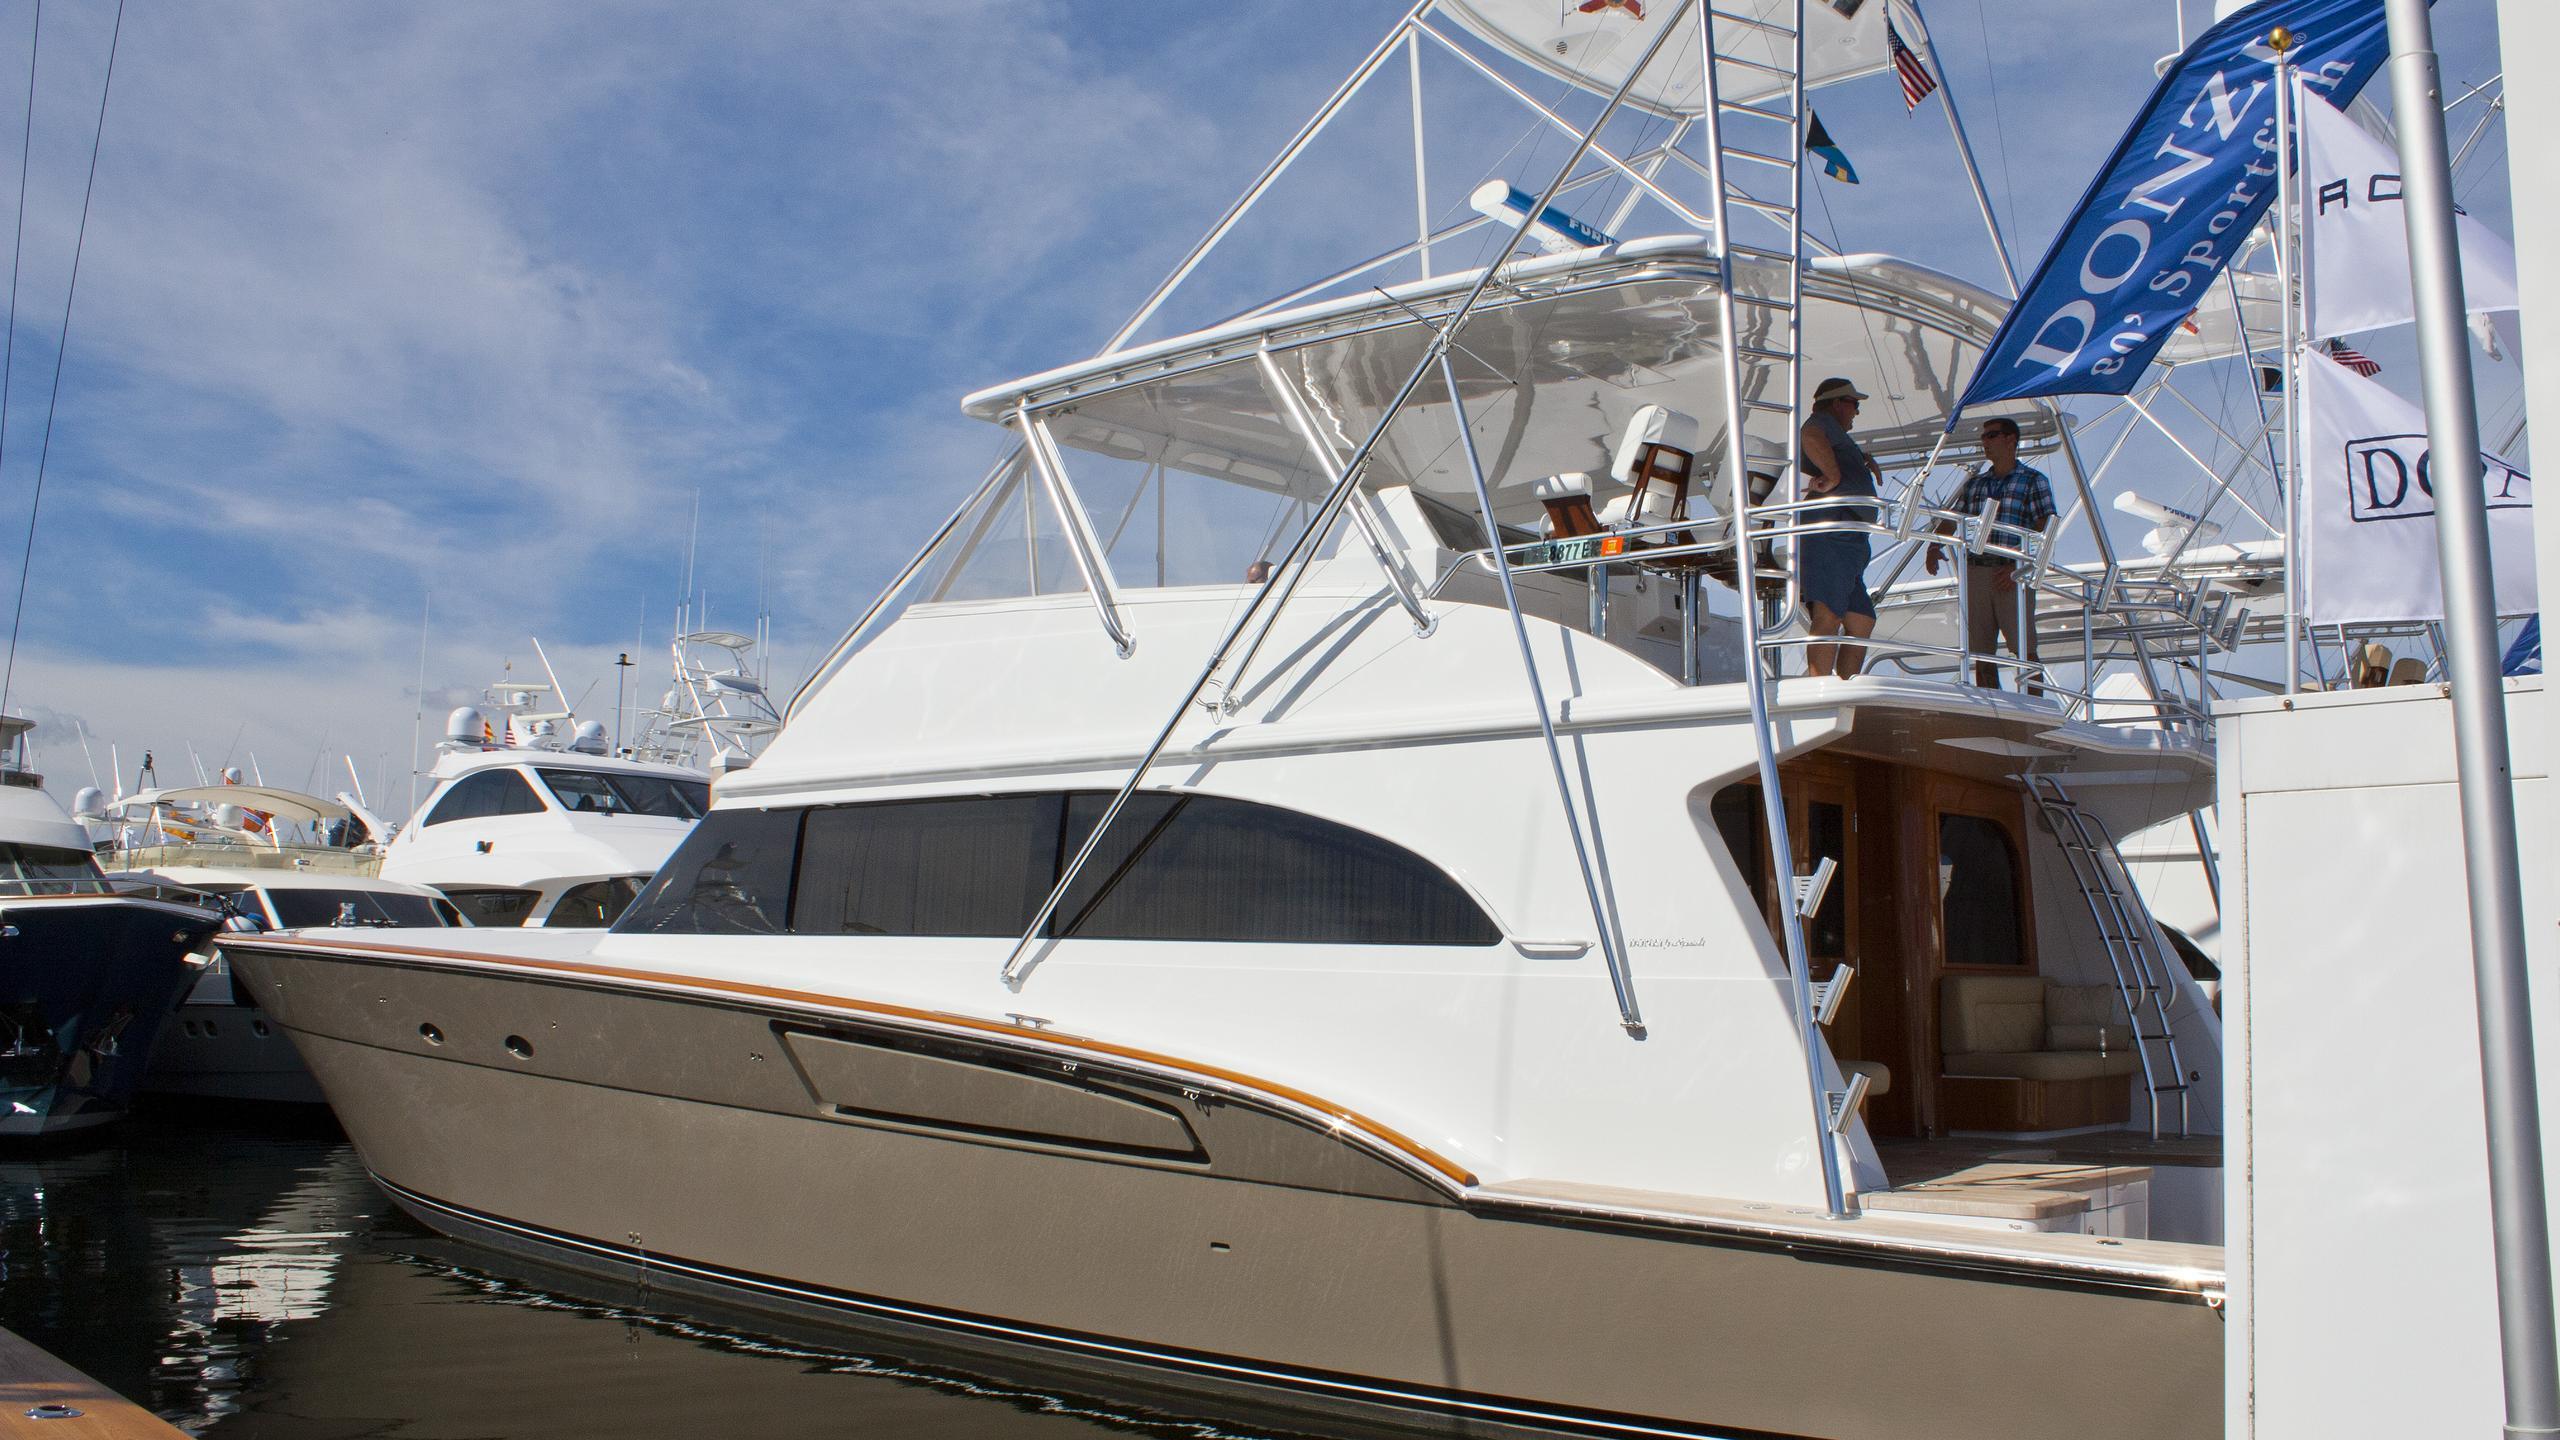 donzi-r80-yacht-exterior